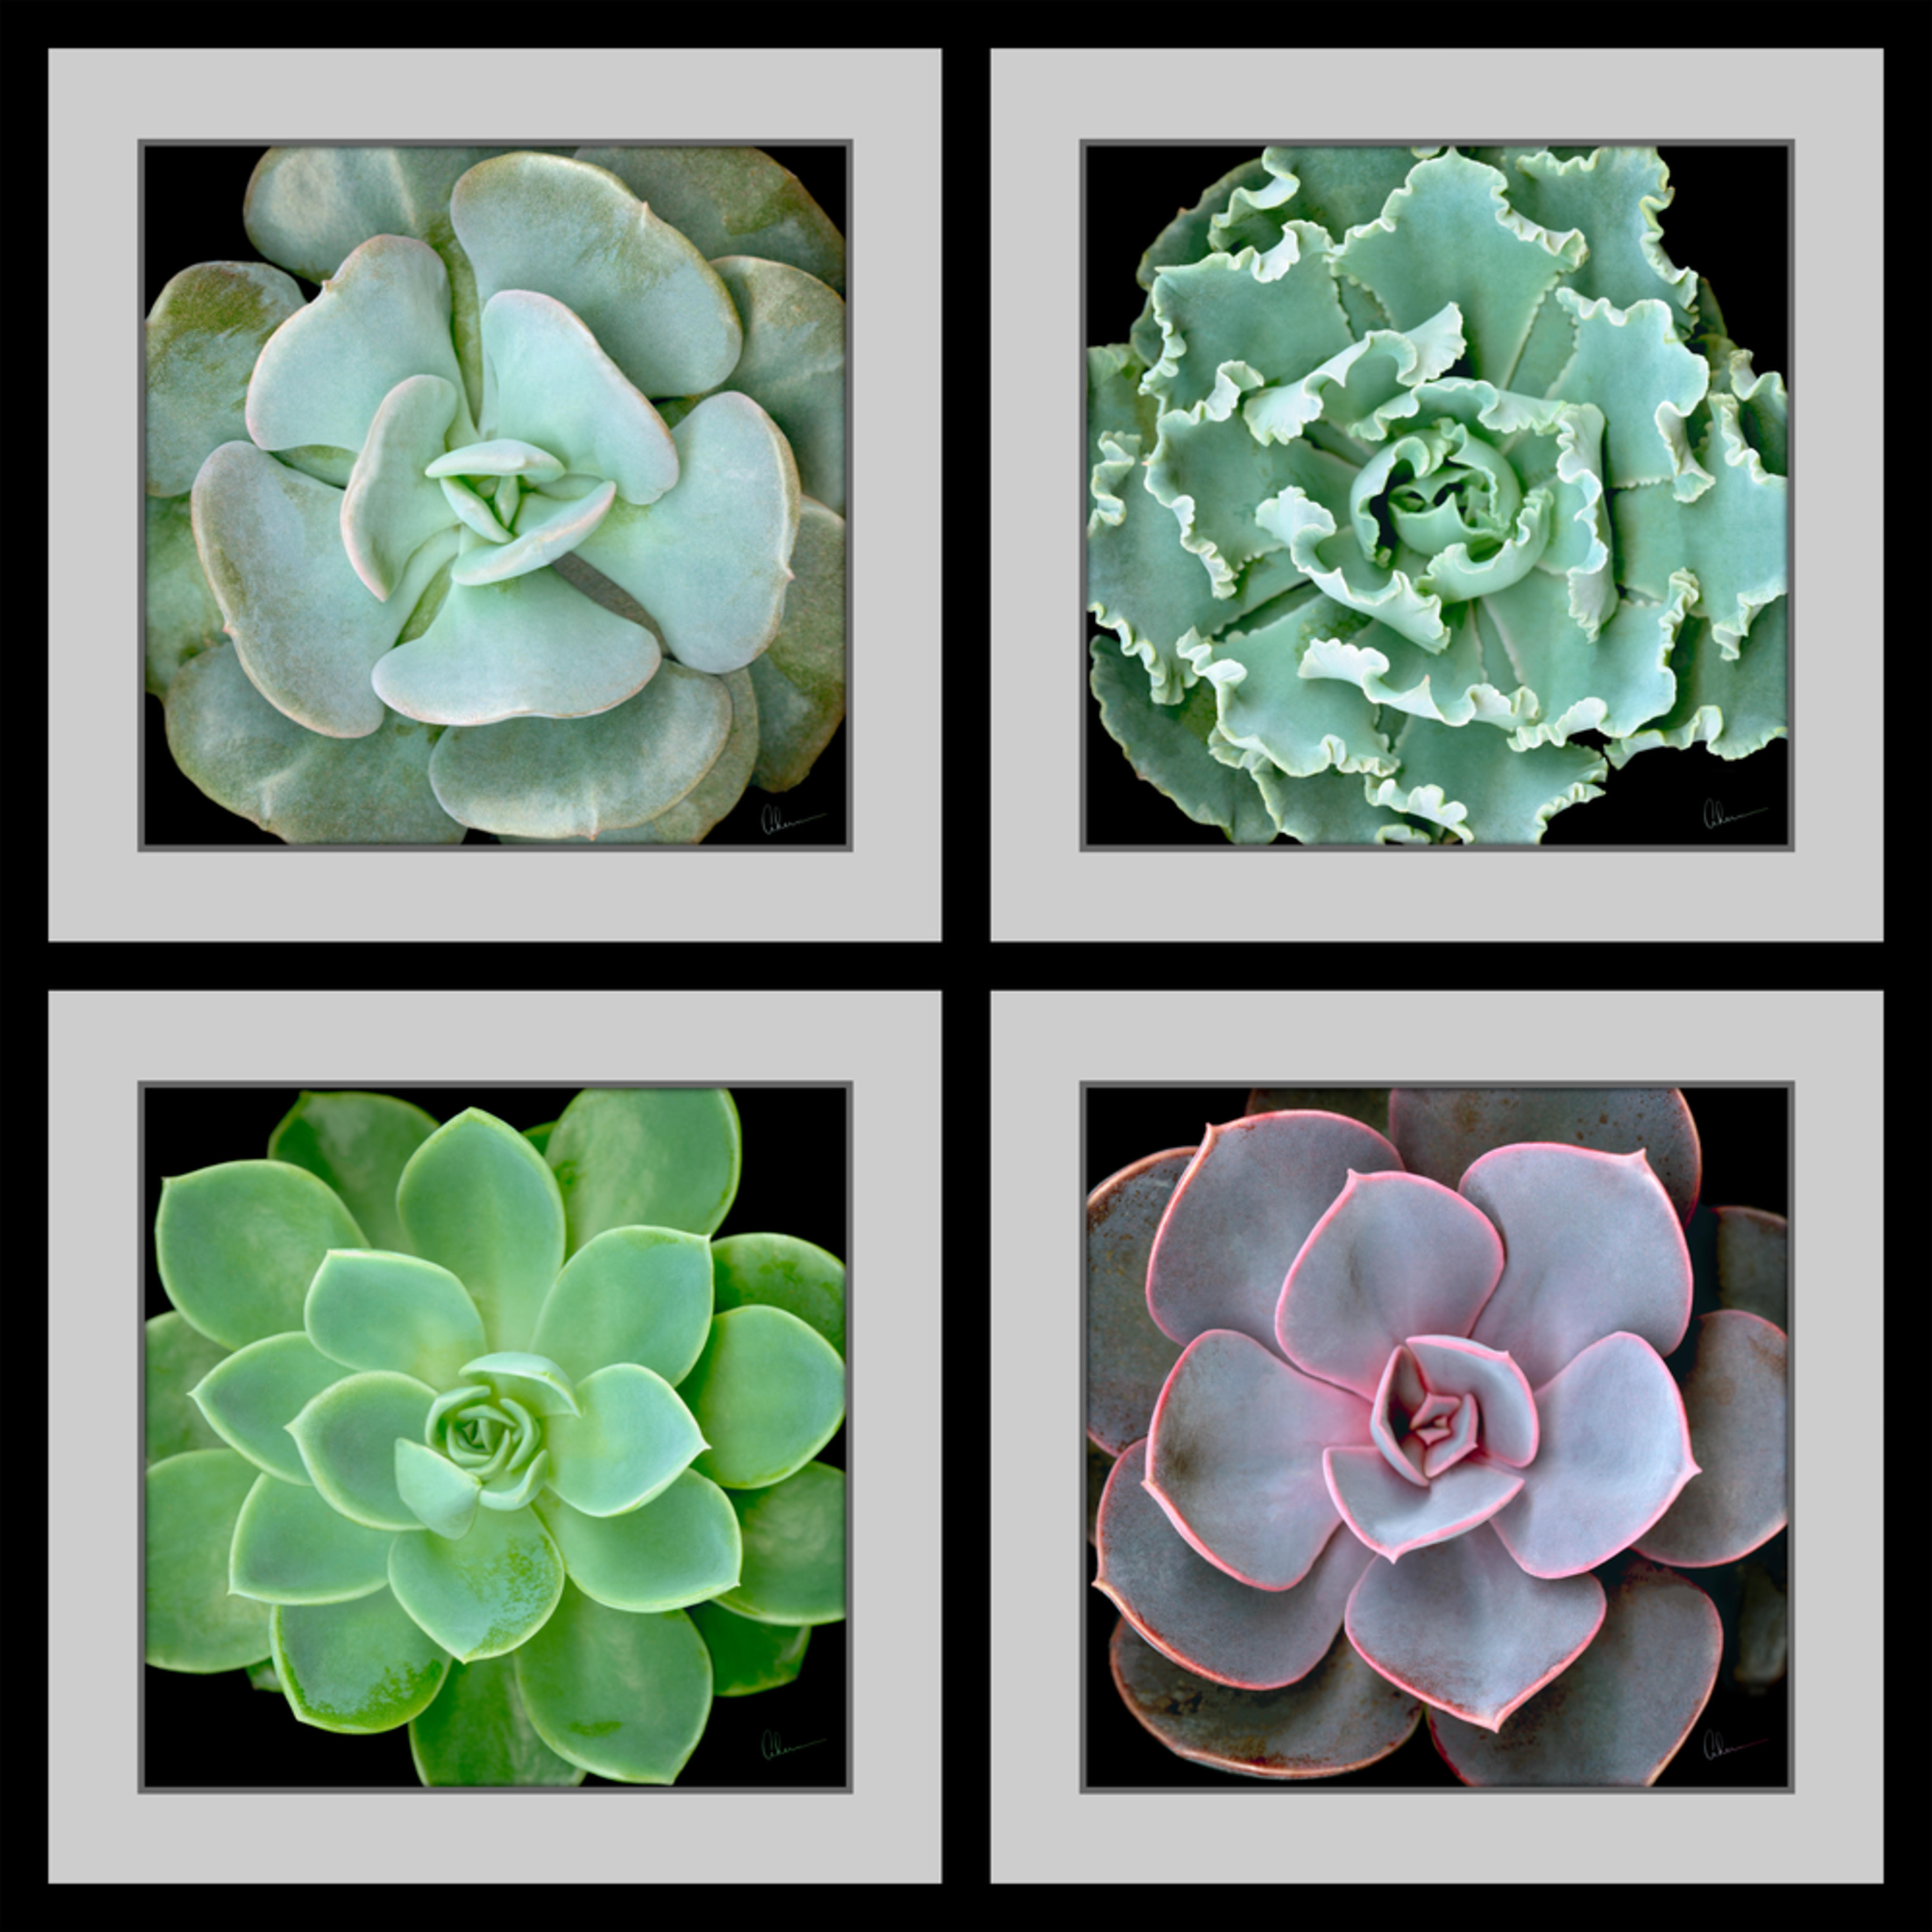 190630 ahern echevaria succulents squared composite 40x40x300 qodnef